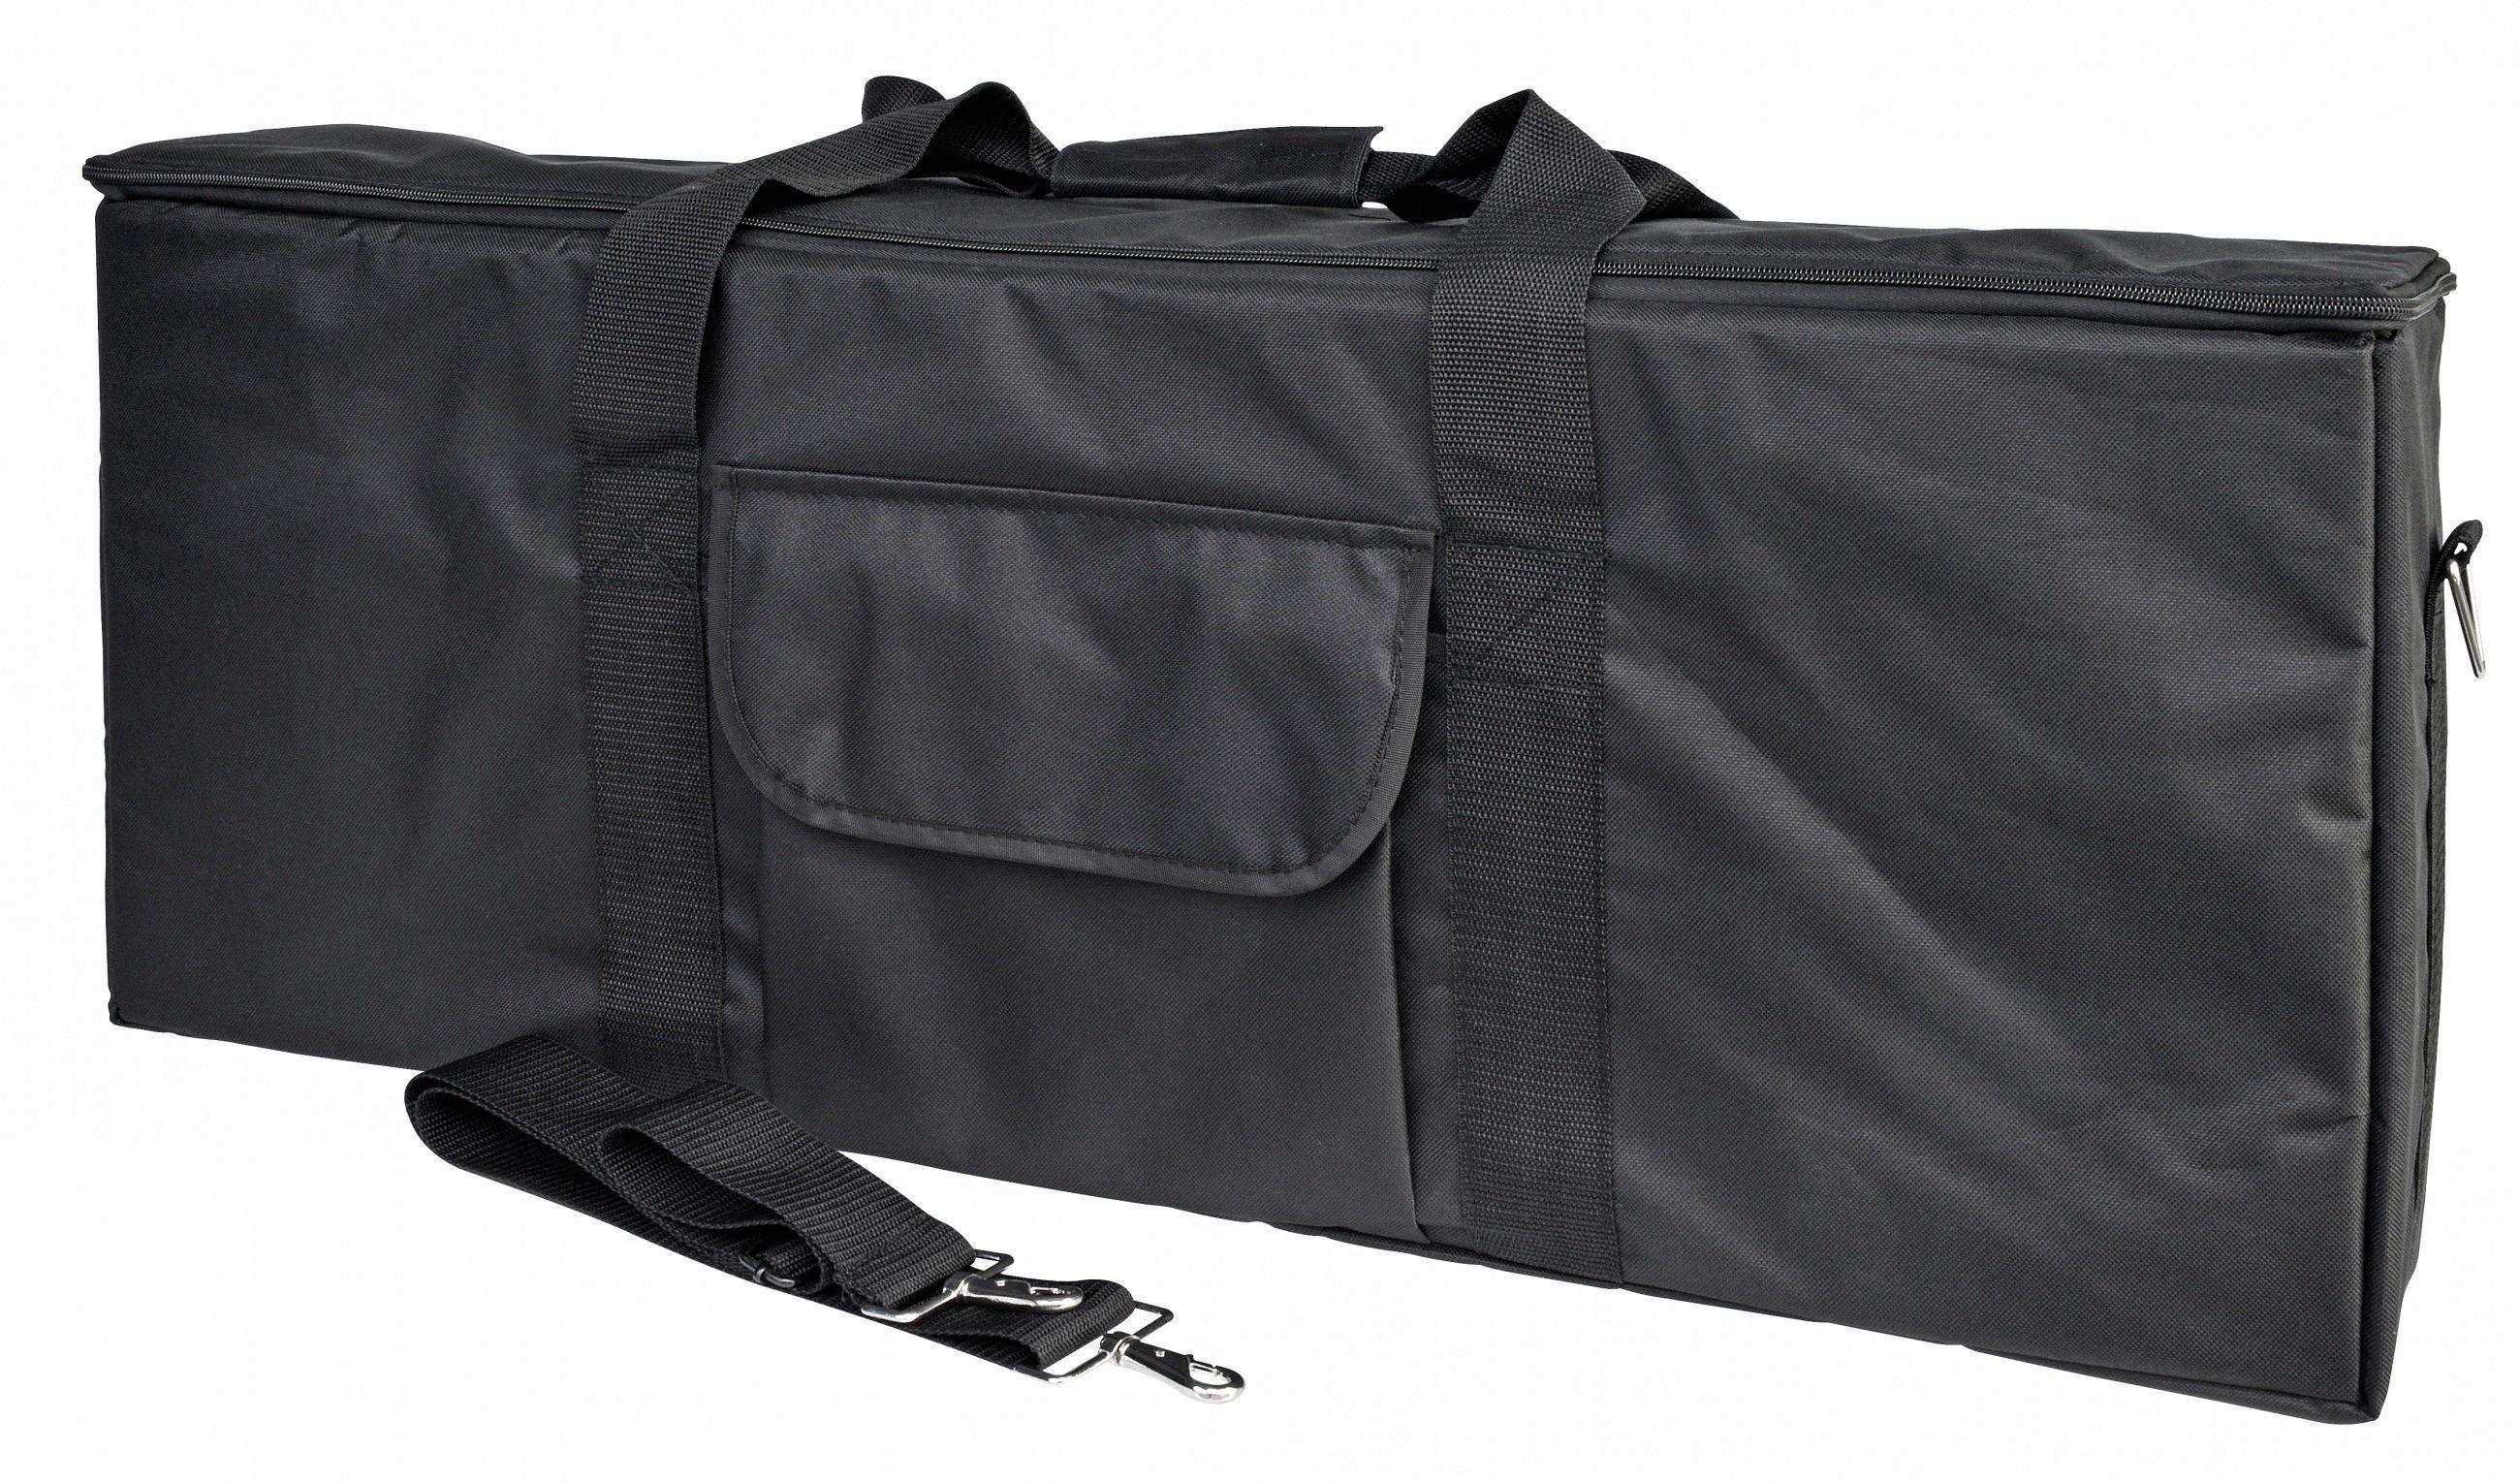 Bresser Fotostudio »Studiotasche für LG-1200/LG-1200A«